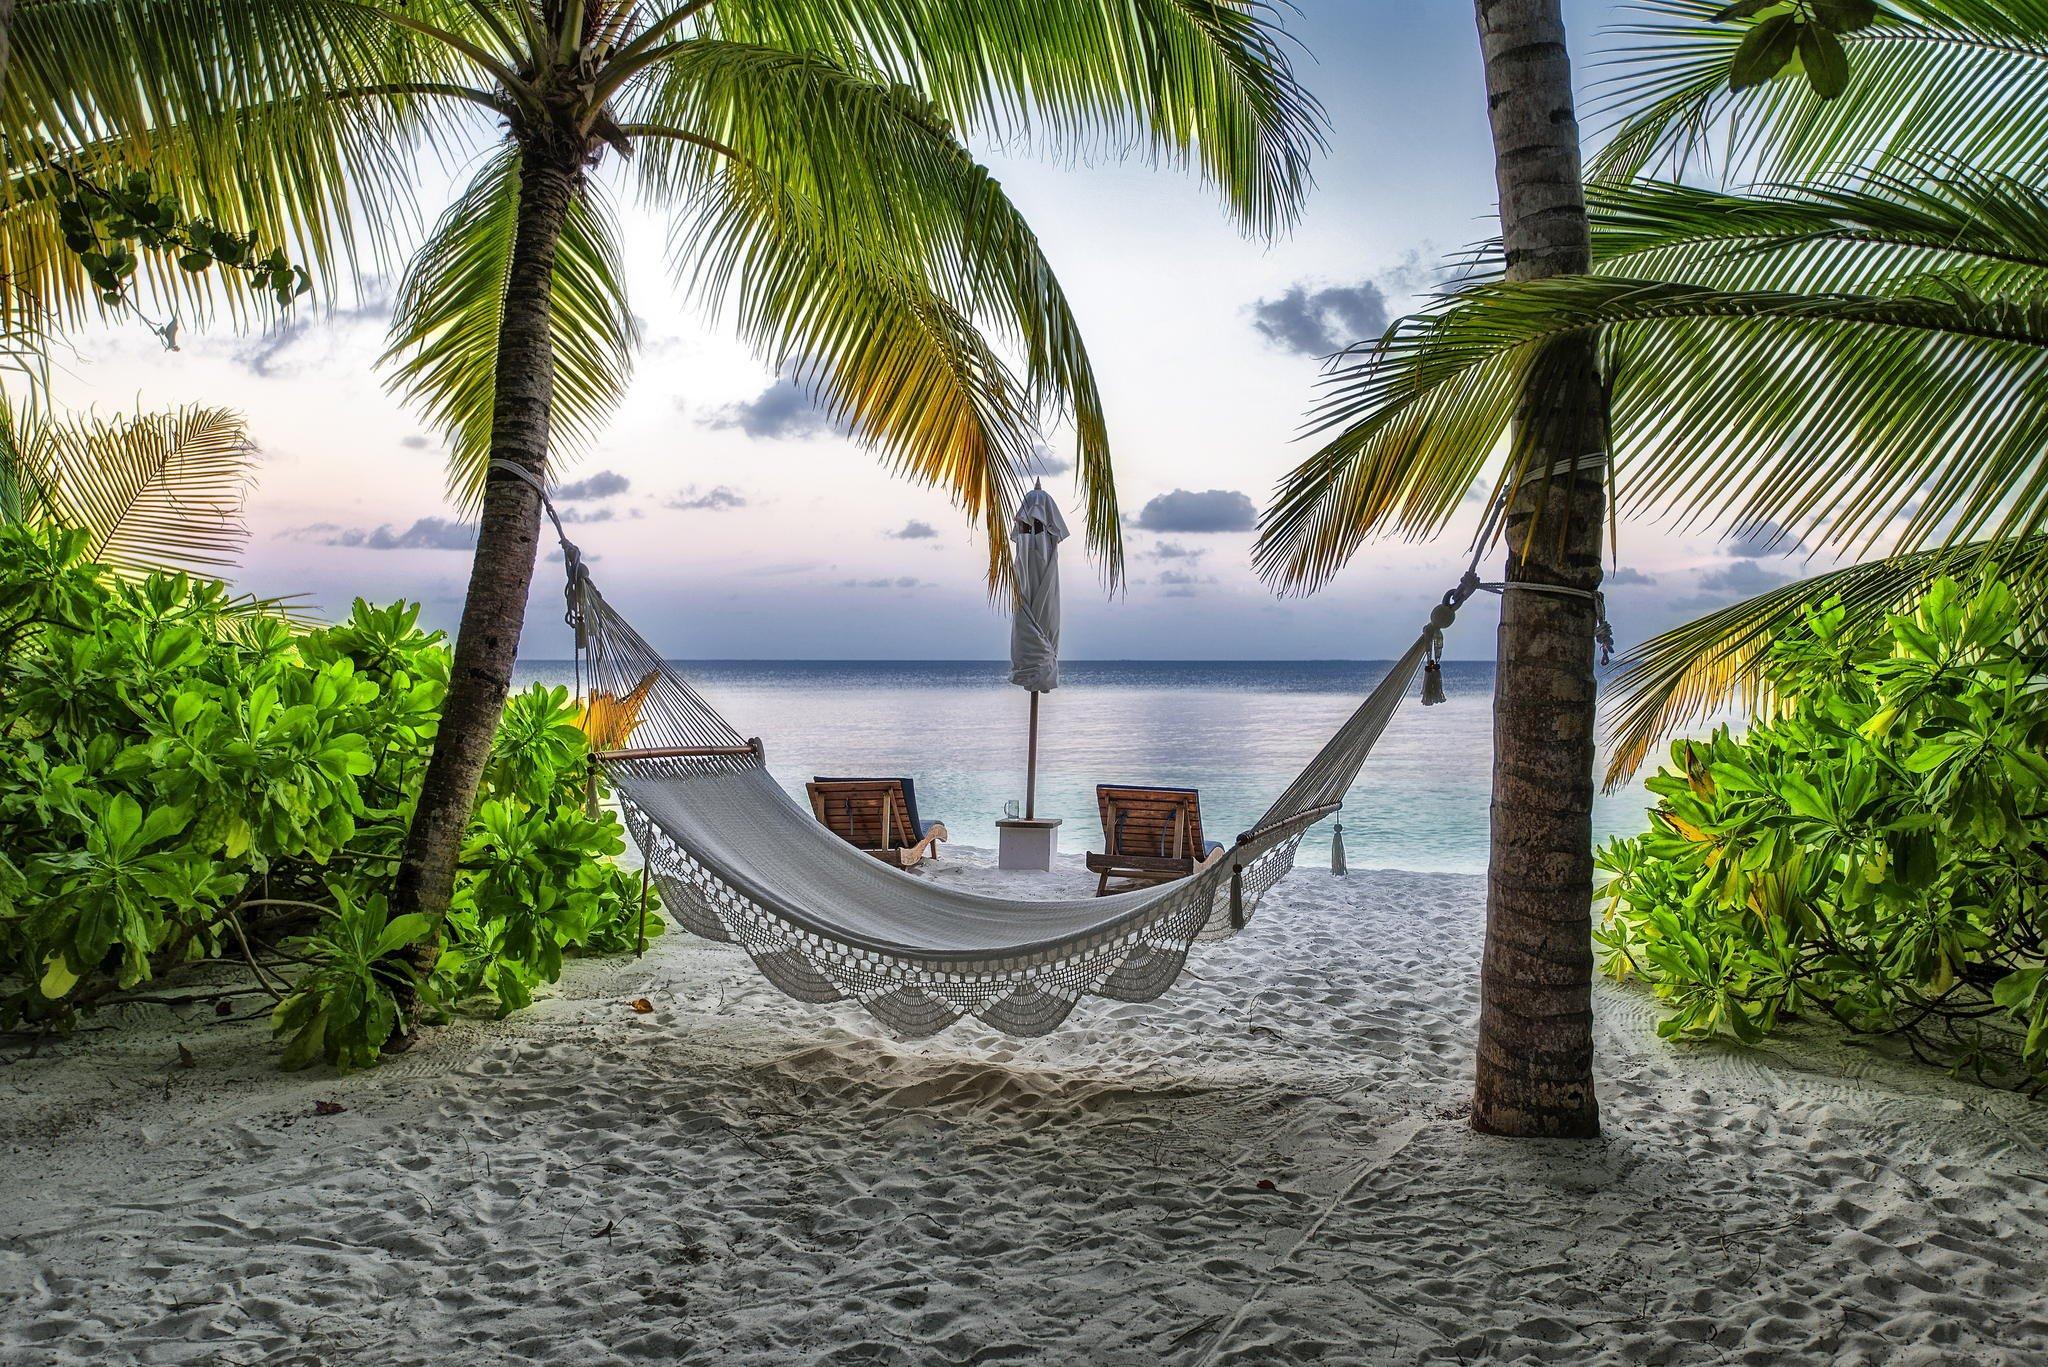 Maldives beach hammock palm resort vacation summer wallpaper   2048x1367   356309   WallpaperUP